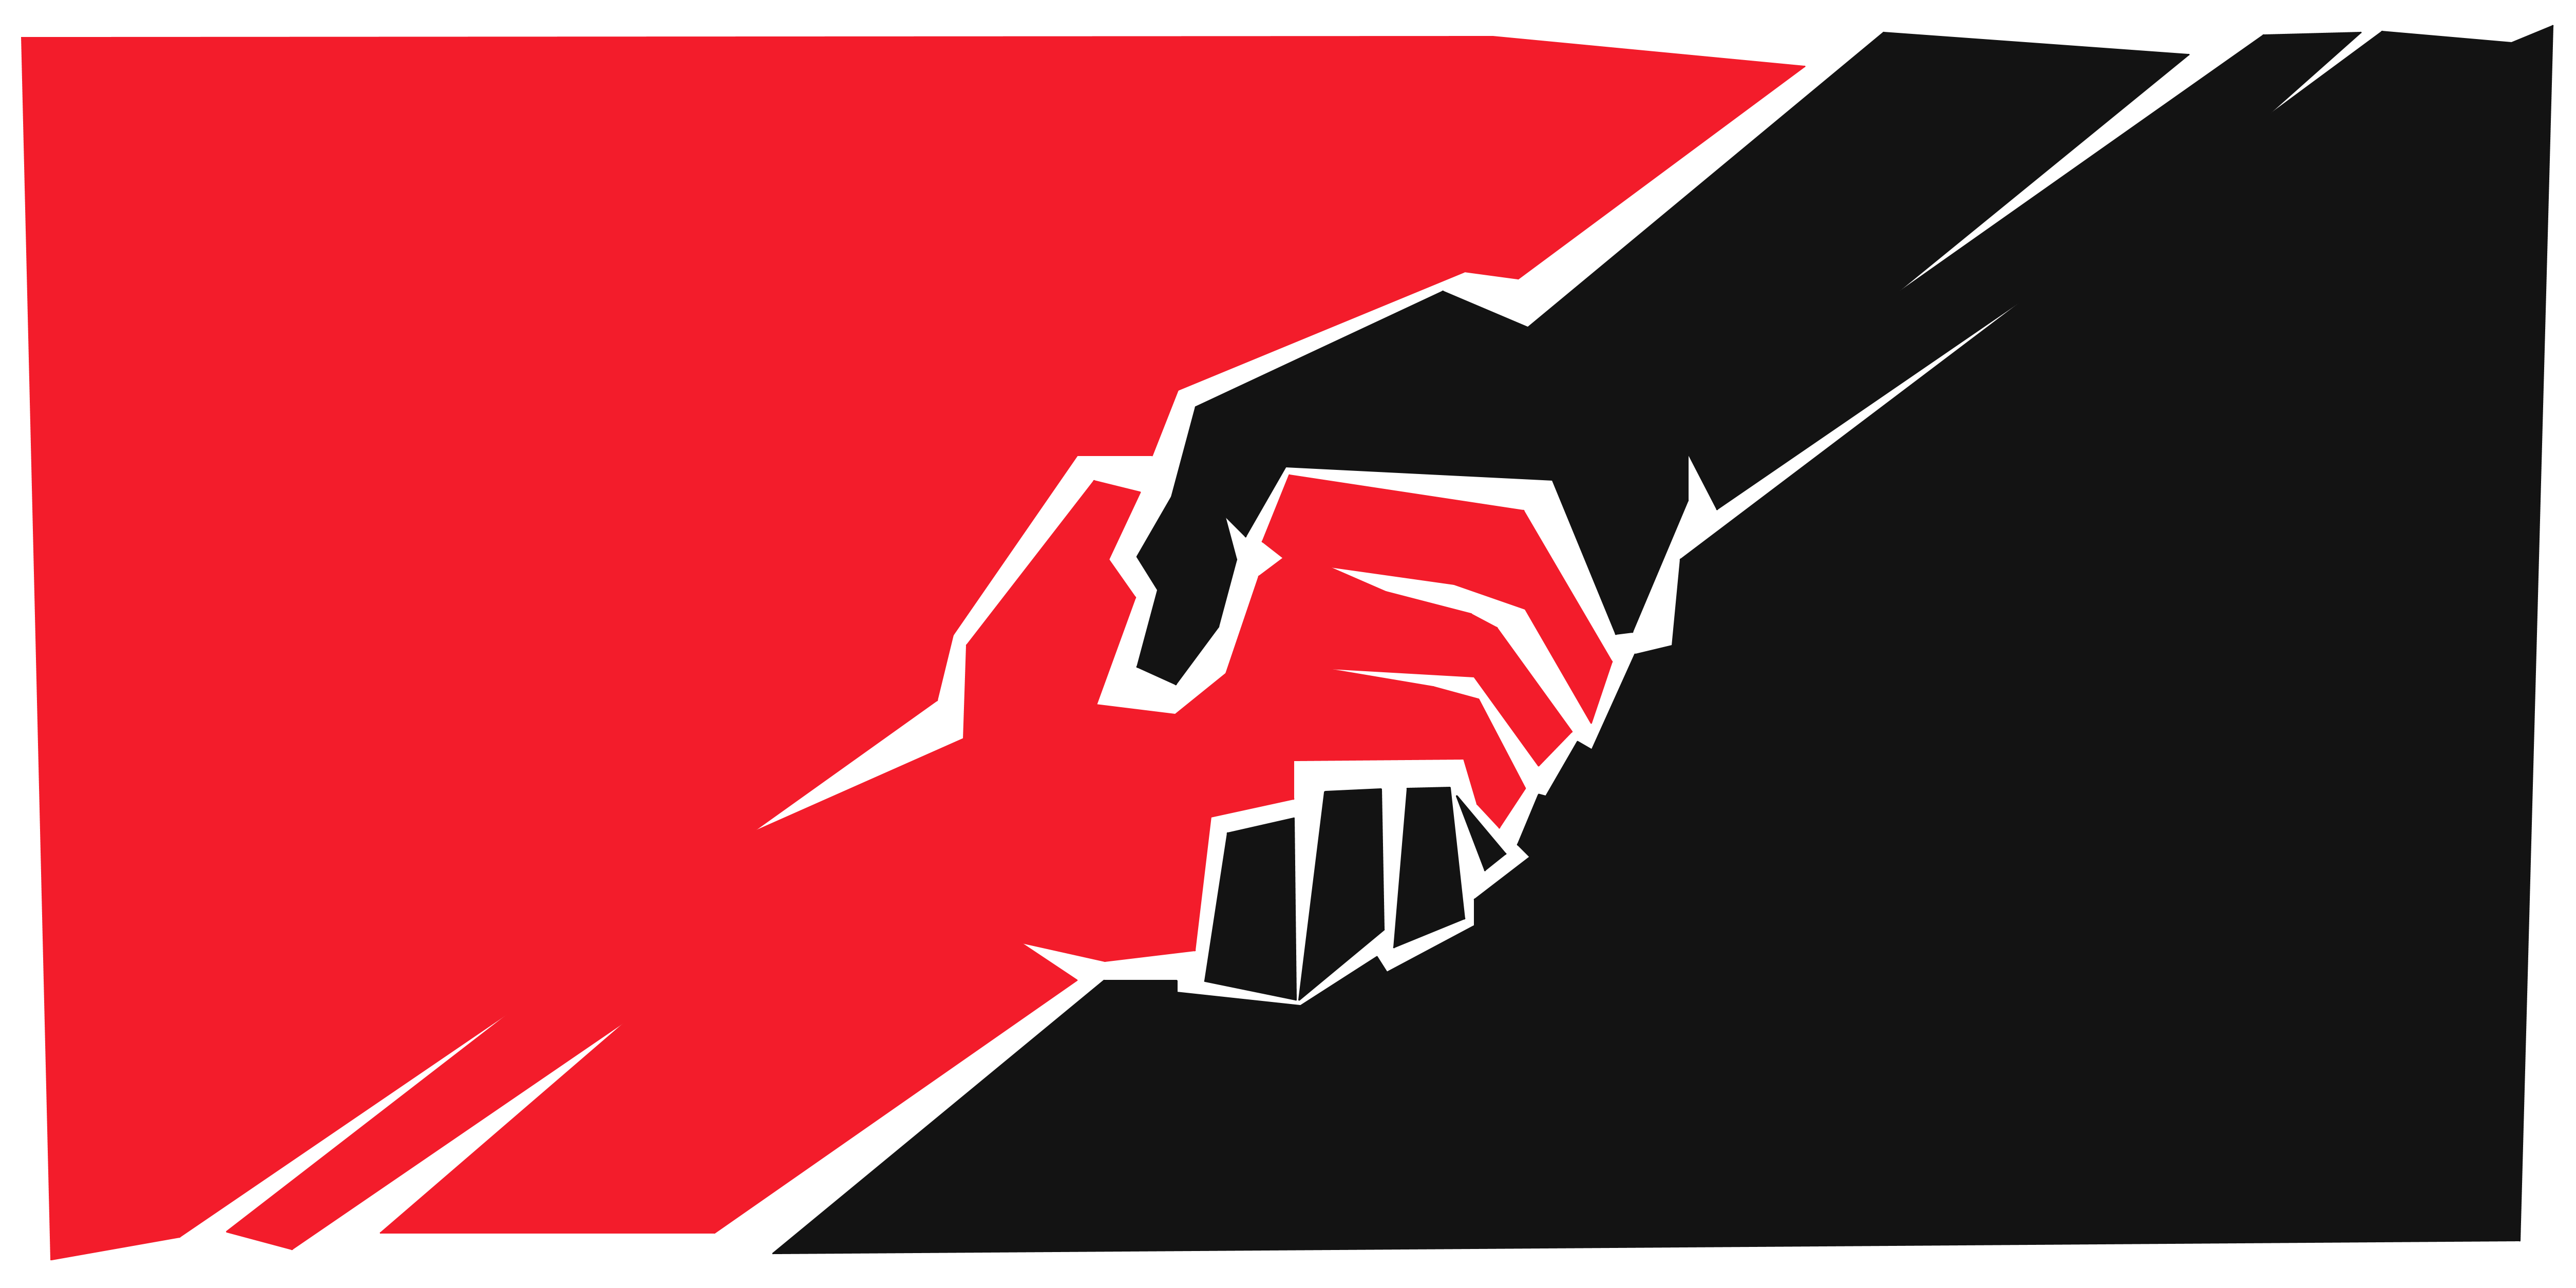 Paris commune robert graham. Handshake clipart socialist